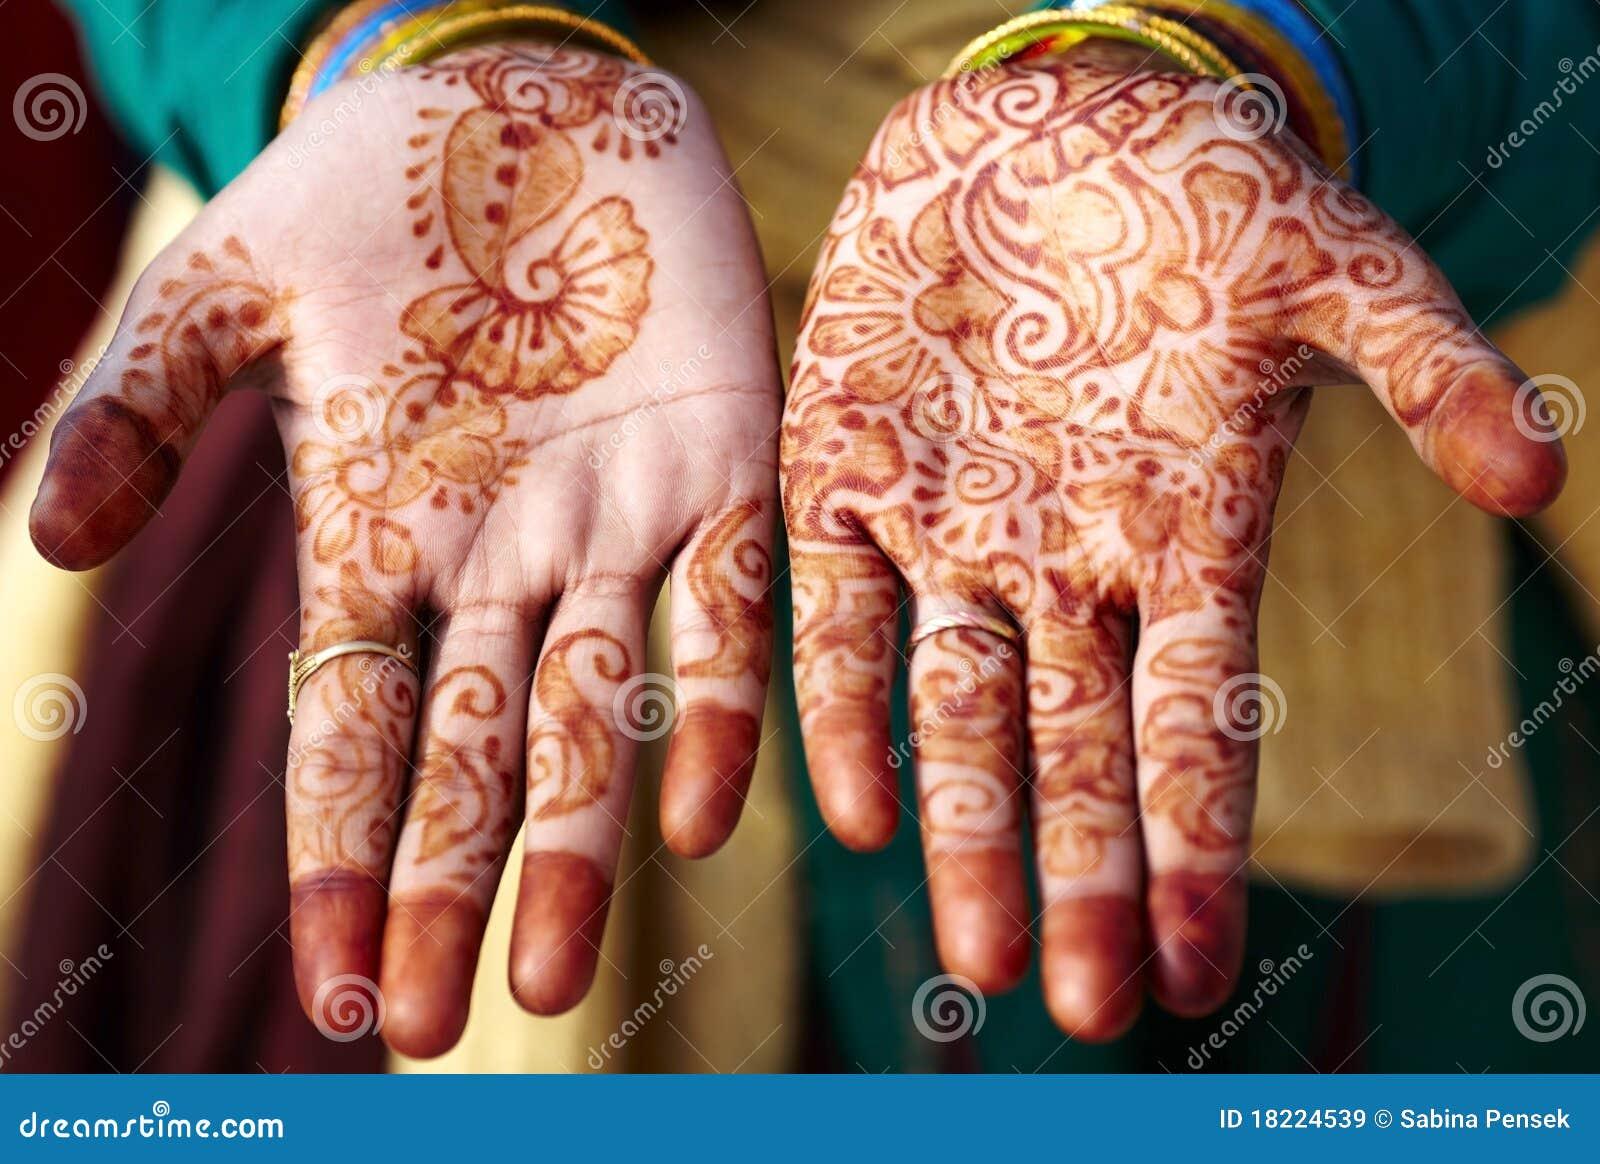 Henna tattoo hand art in india stock image image 18224539 for Henna tattoo price